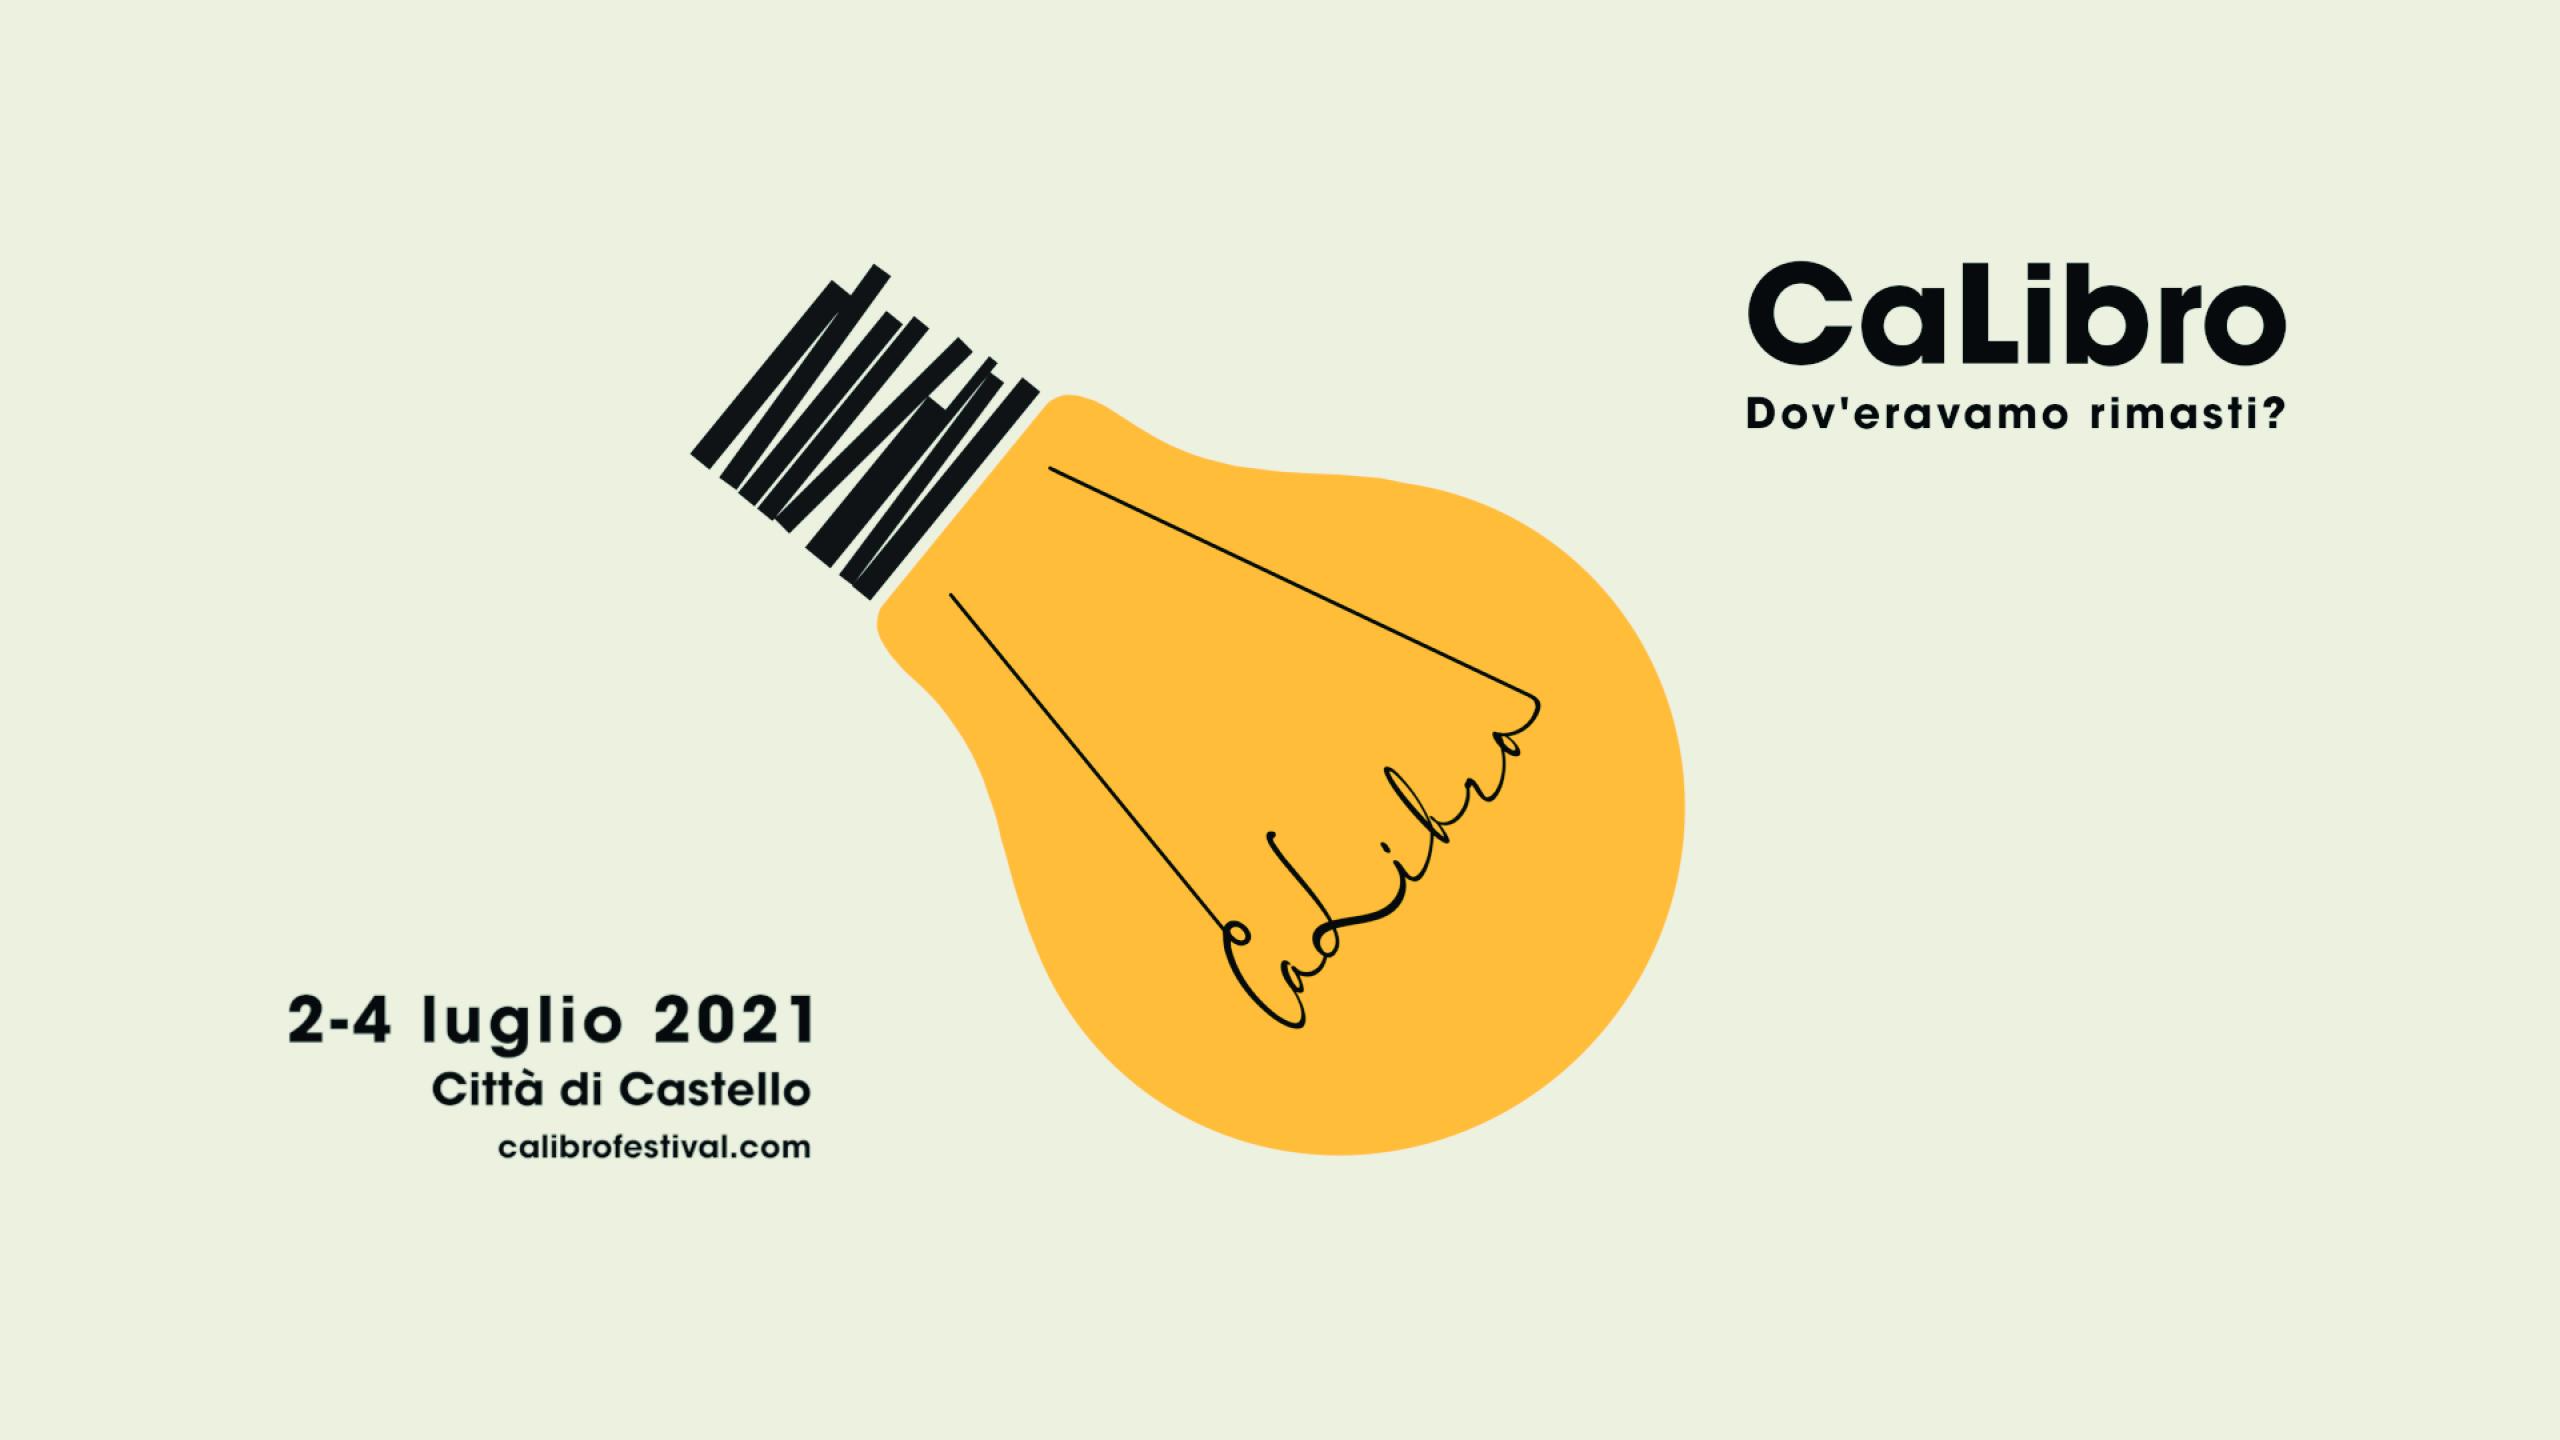 http://www.calibrofestival.com/wp-content/uploads/2021/06/copertina-web.jpg